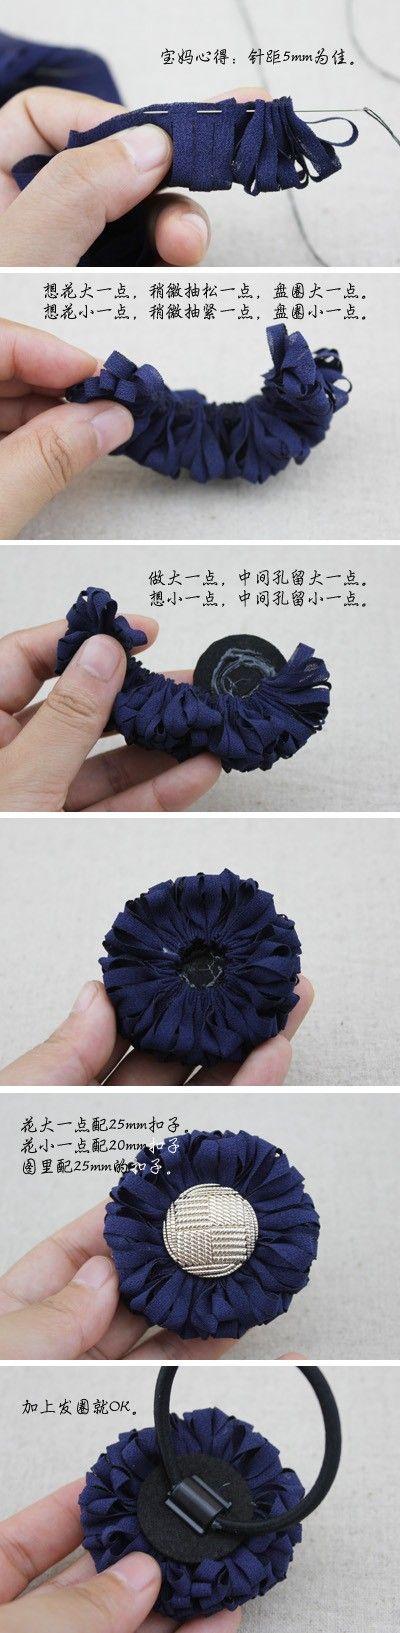 fiori di stoffa fabric flower 小花(二)9.9元购买此款发饰的制作材料,两朵制作材料,一朵的材料,包括扣子发绳。需要的加QQ:402743916或去淘宝-大琳的店-咨询店主。